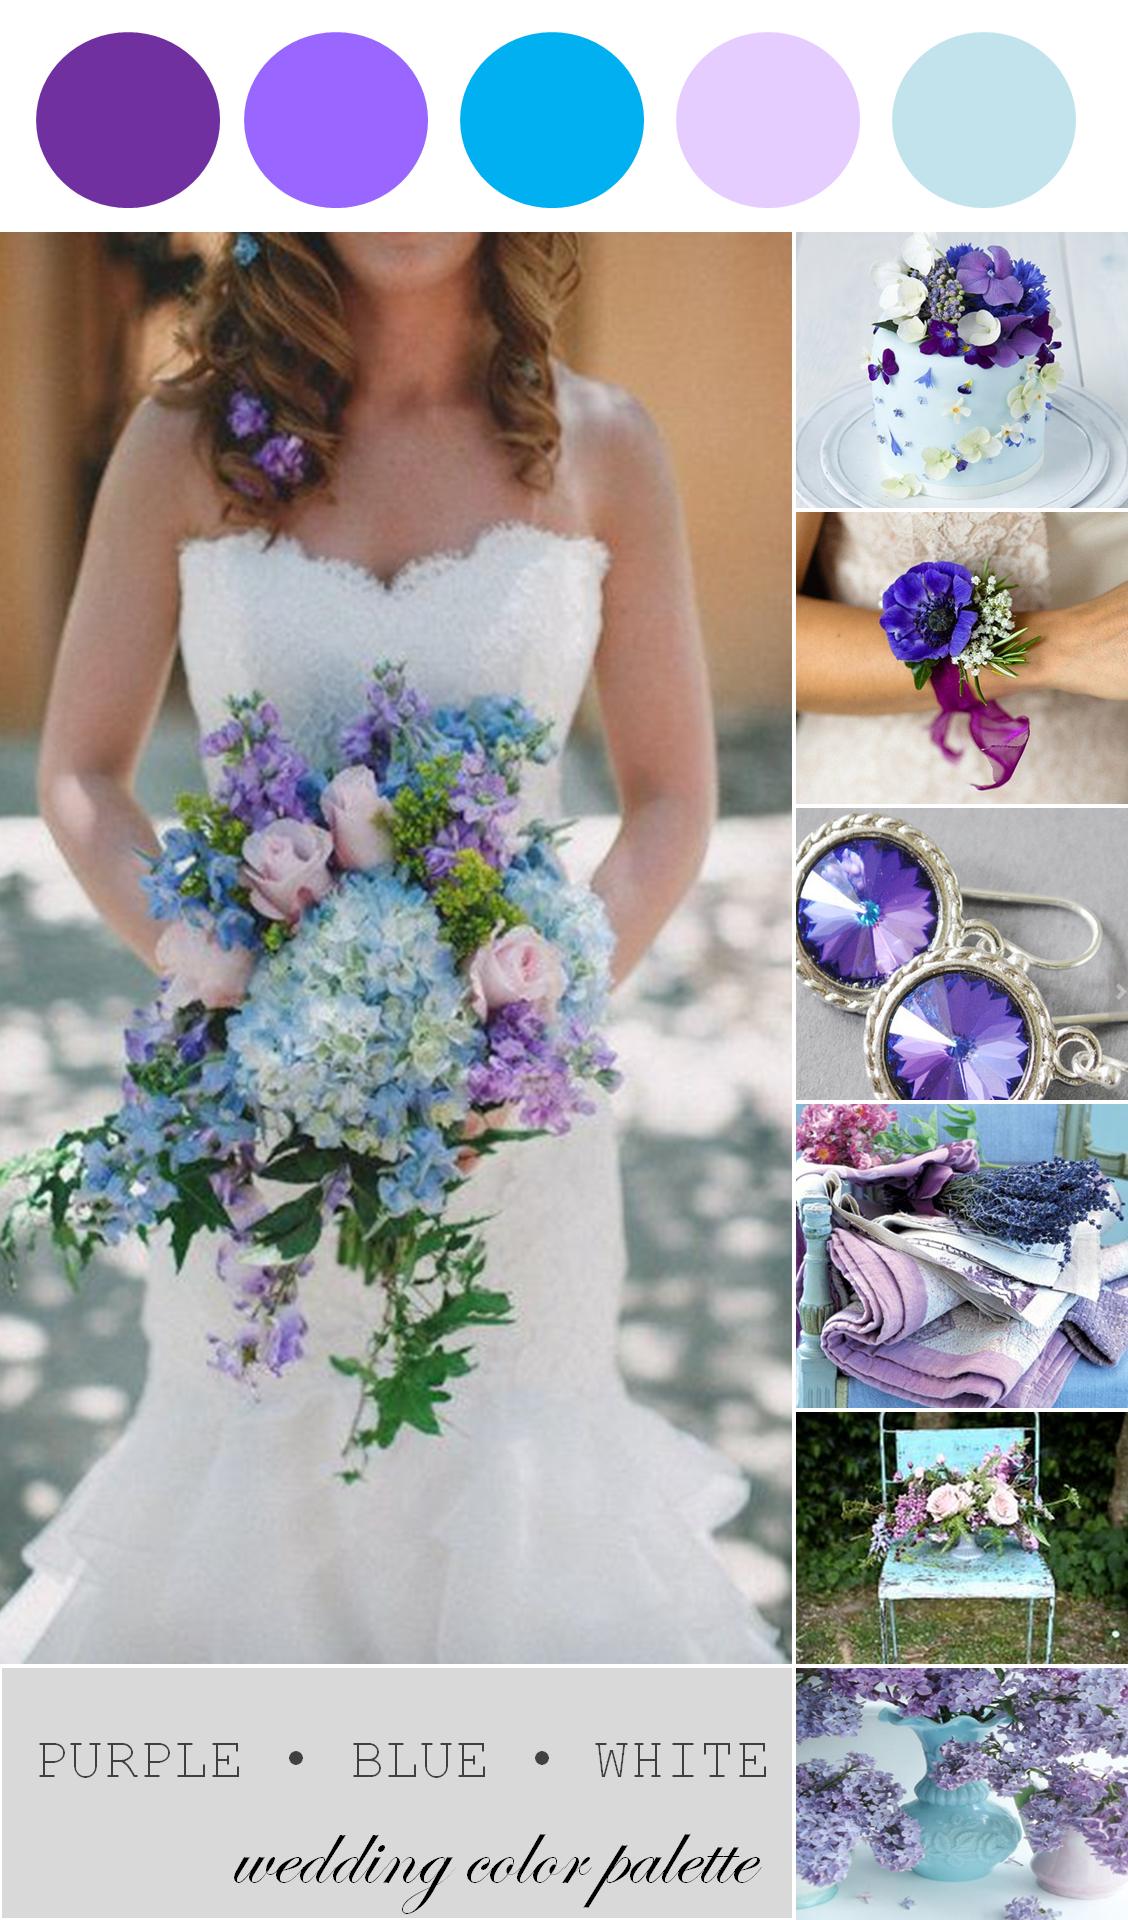 Blue and white wedding decor  Wedding Color Palette  Love  Lust  Pinterest  Weddings Wedding